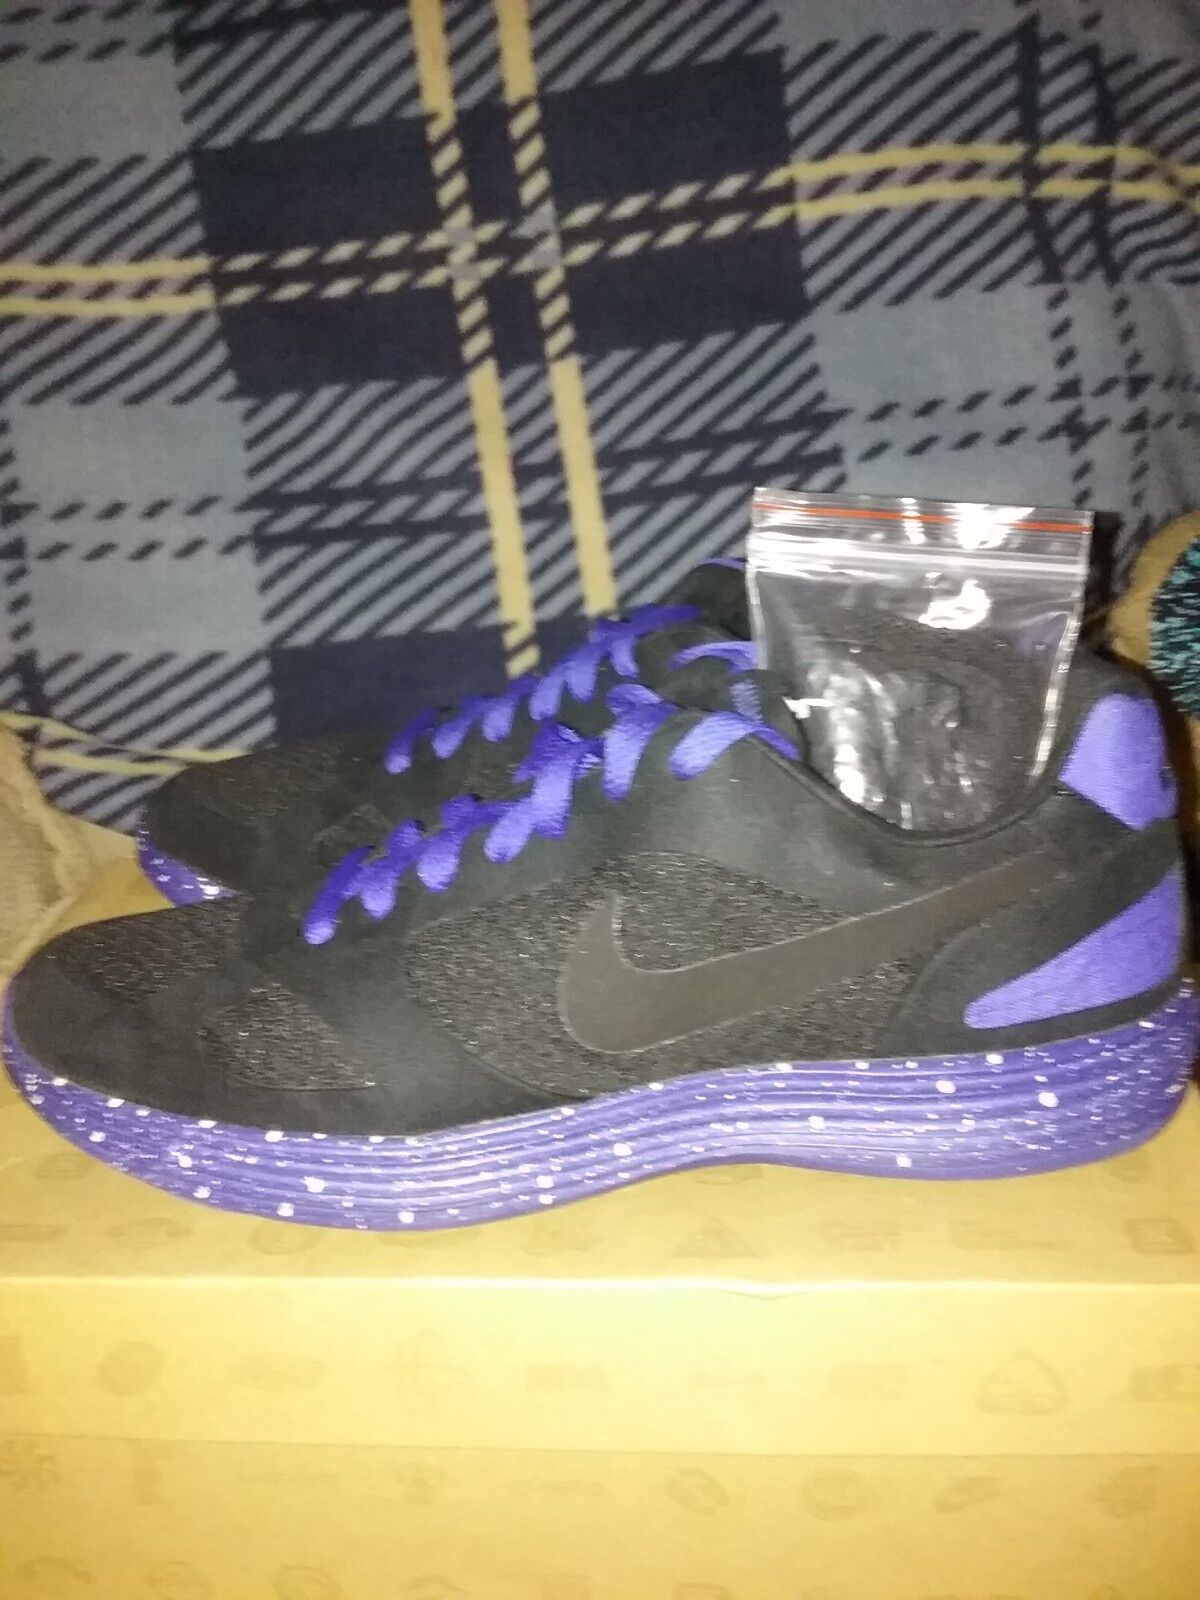 Nike Lunar Mariah 10.5 tz qs huarache yeezy Jordan kaws